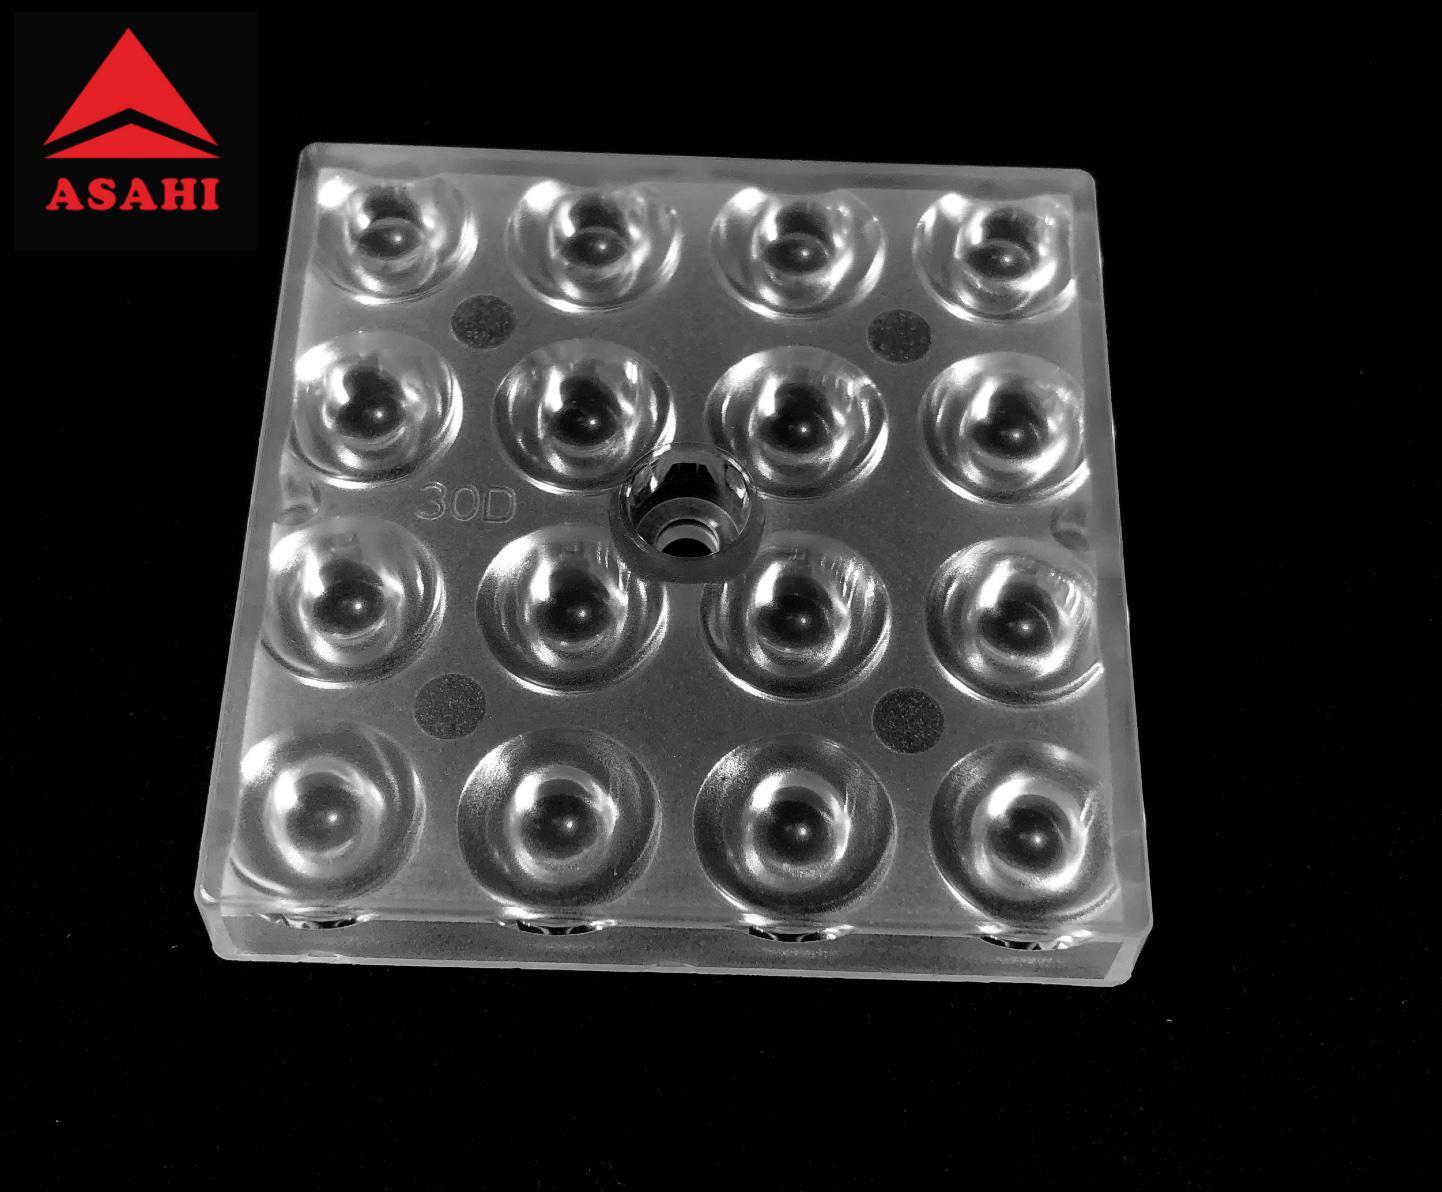 Top quality optical lentes 16LEDs optical lens 030LED beam 30G ALHB50D16LED30G 1